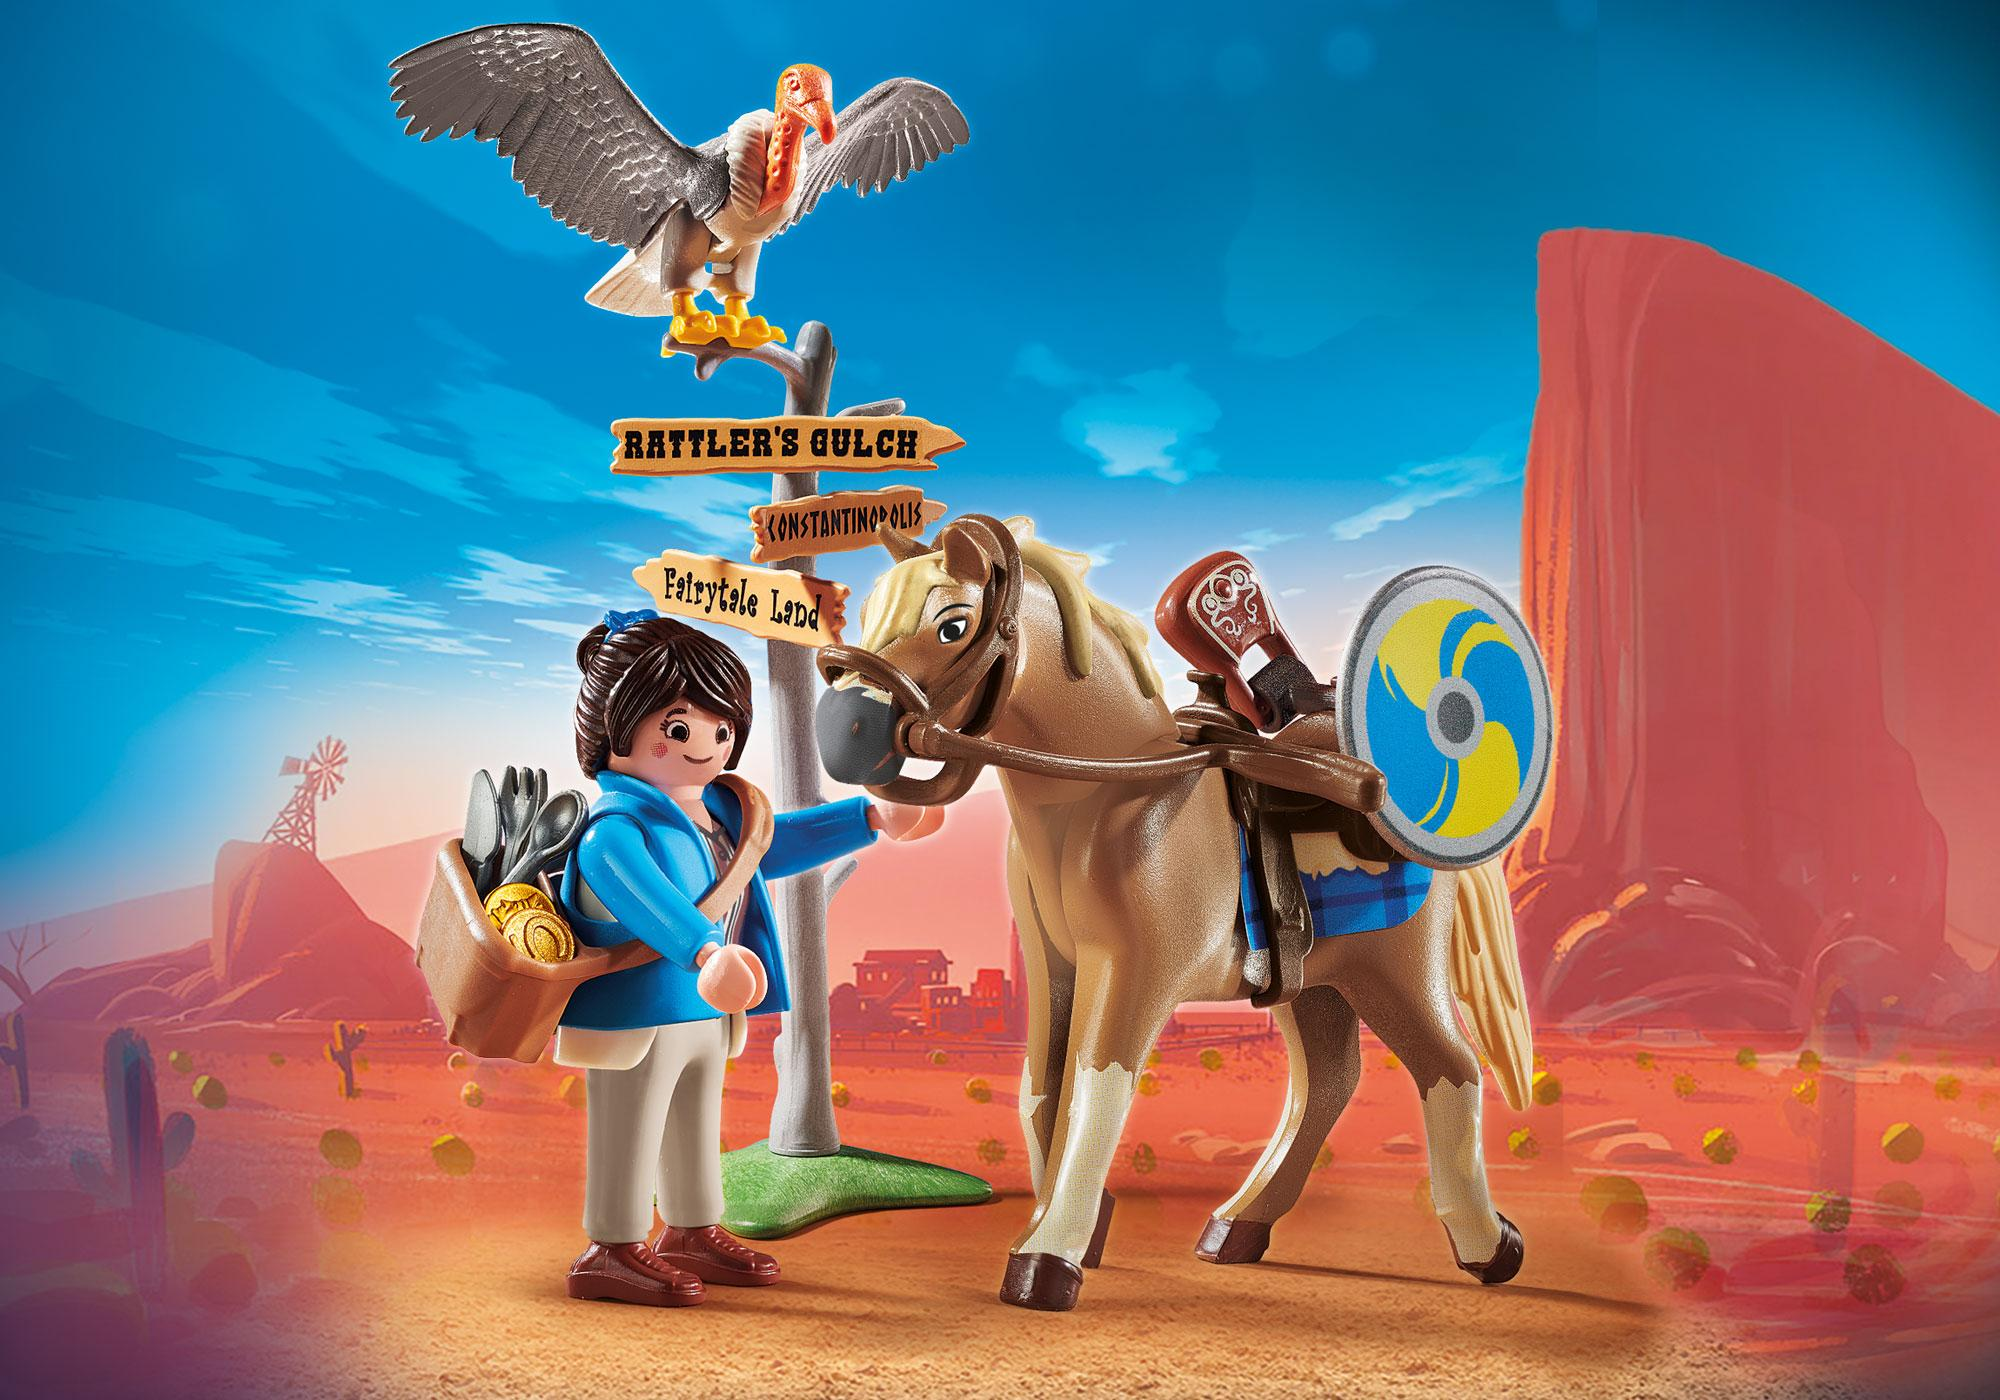 http://media.playmobil.com/i/playmobil/70072_product_detail/PLAYMOBIL: THE MOVIE Marla avec cheval